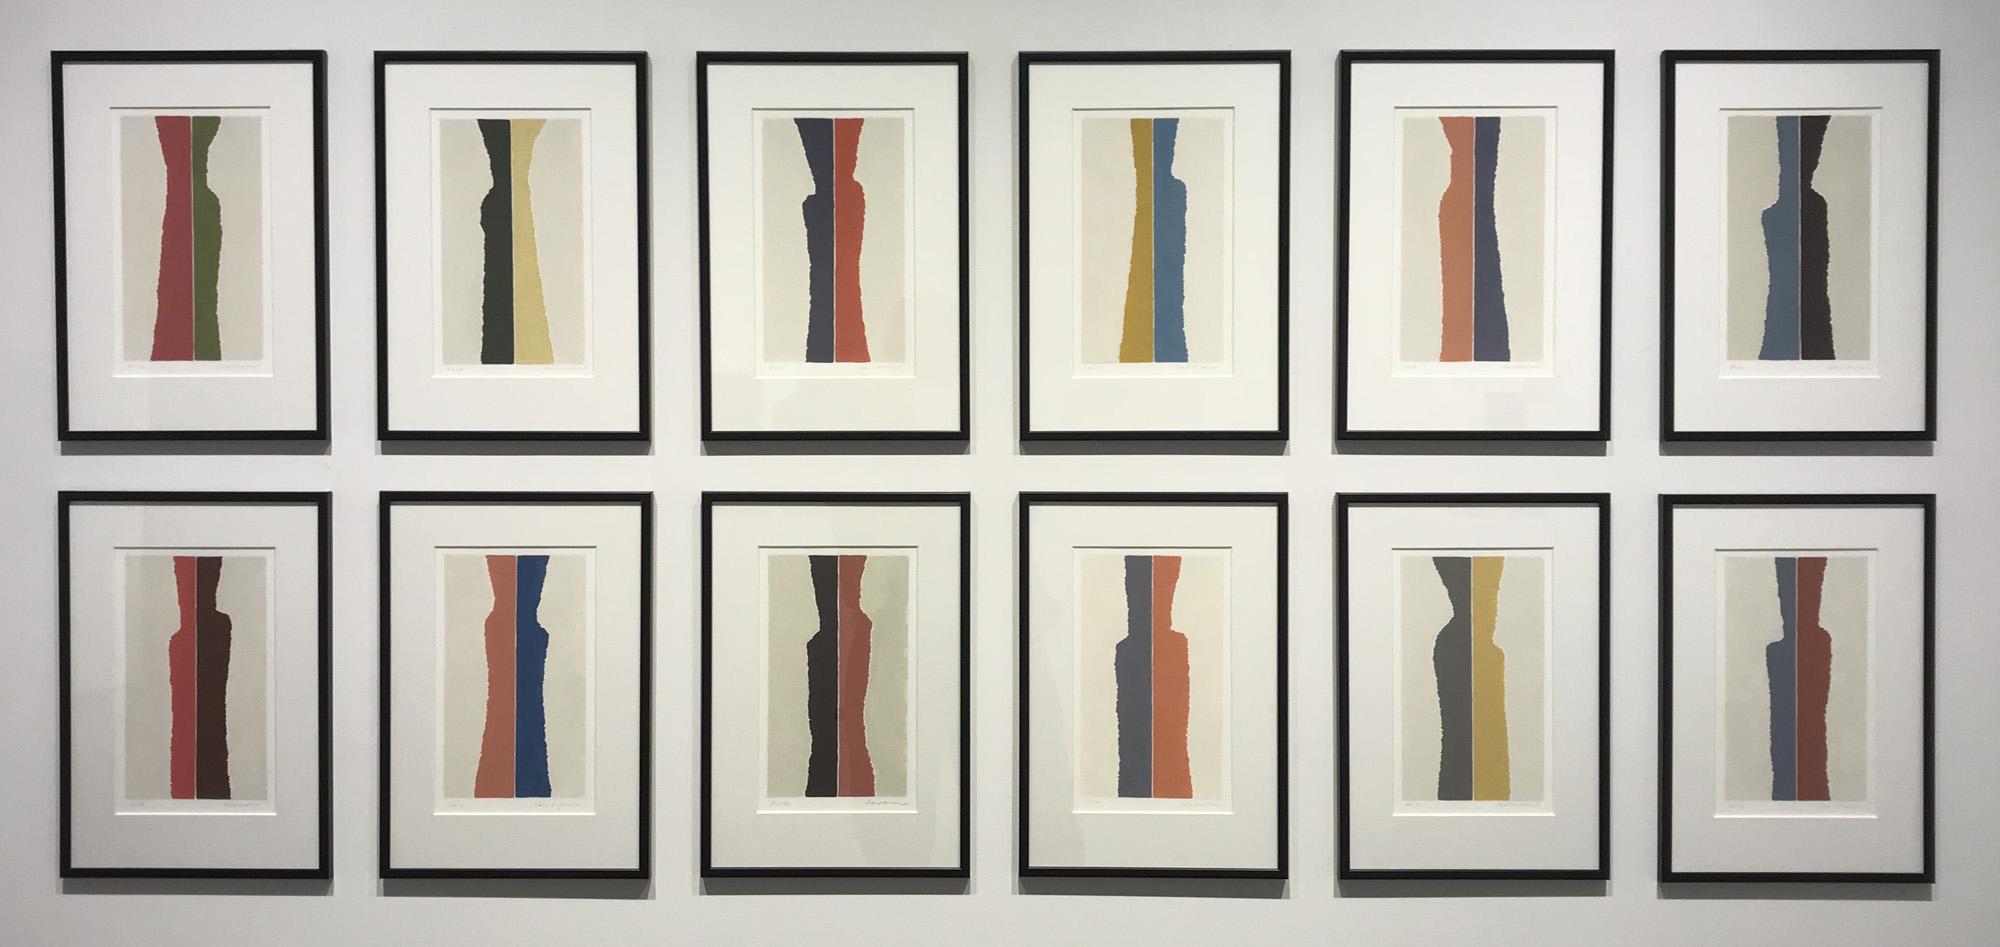 civitella ranieri drawings,  2012 acrylic on paper 15 1/2 x 10 3/4 inches each